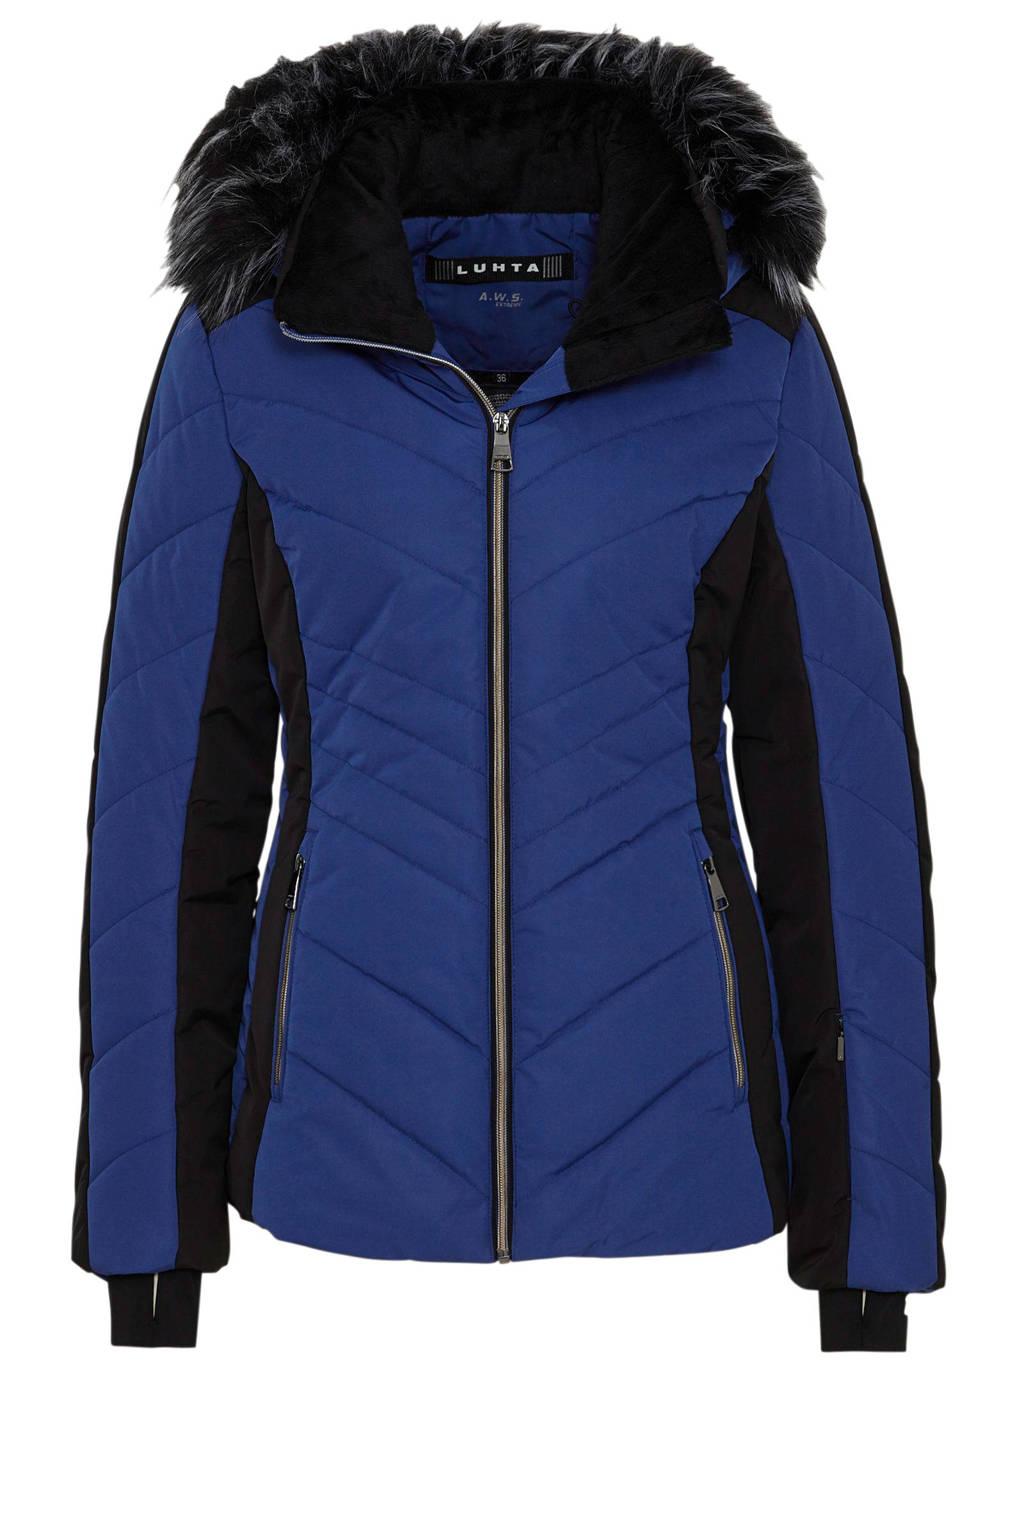 Luhta ski-jack Jalasjoki blauw, Blauw/zwart